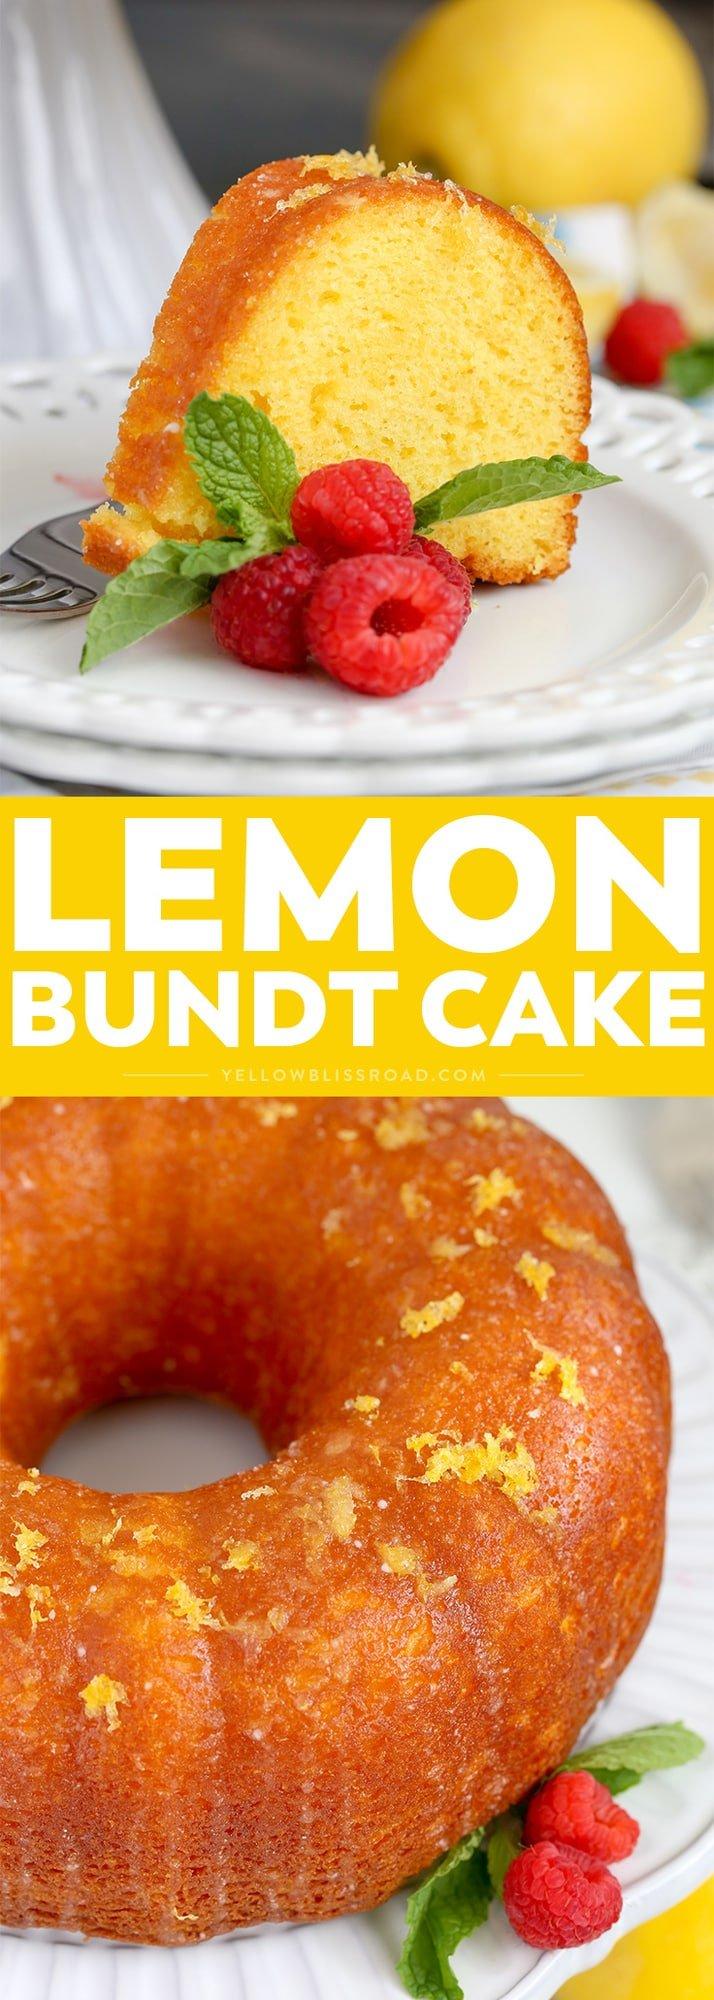 Lemon Bundt Cake - Intensely flavored lemon cake finished with a unique glazing technique to lock in even more lemon flavor. It's the best summer dessert!